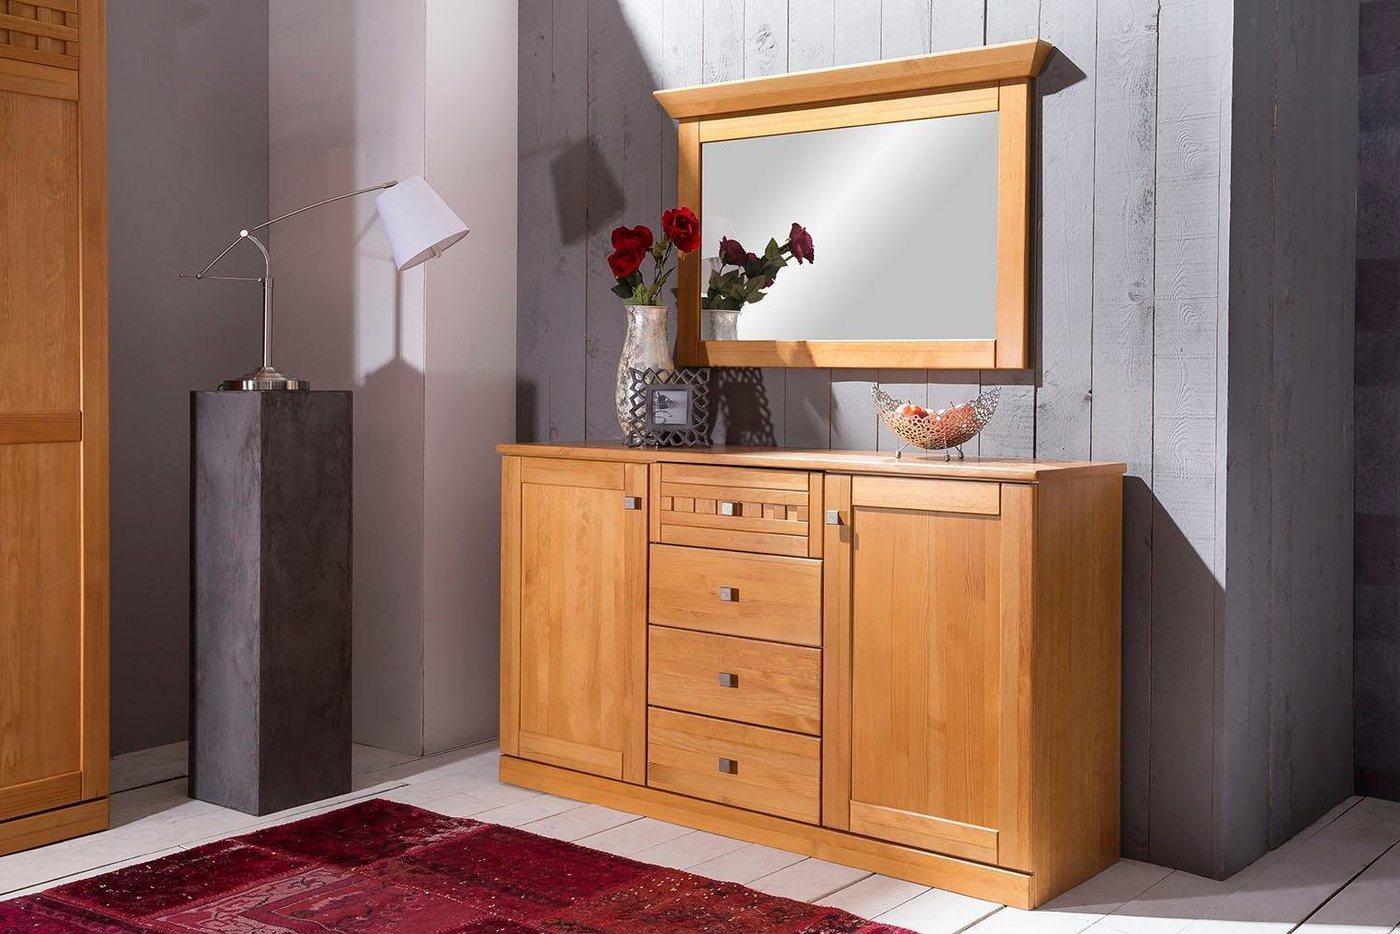 Premium collection by Home affaire Sideboard Romantika mit Softclose-Funktion Breite 149 cm gelb | 05901348042965